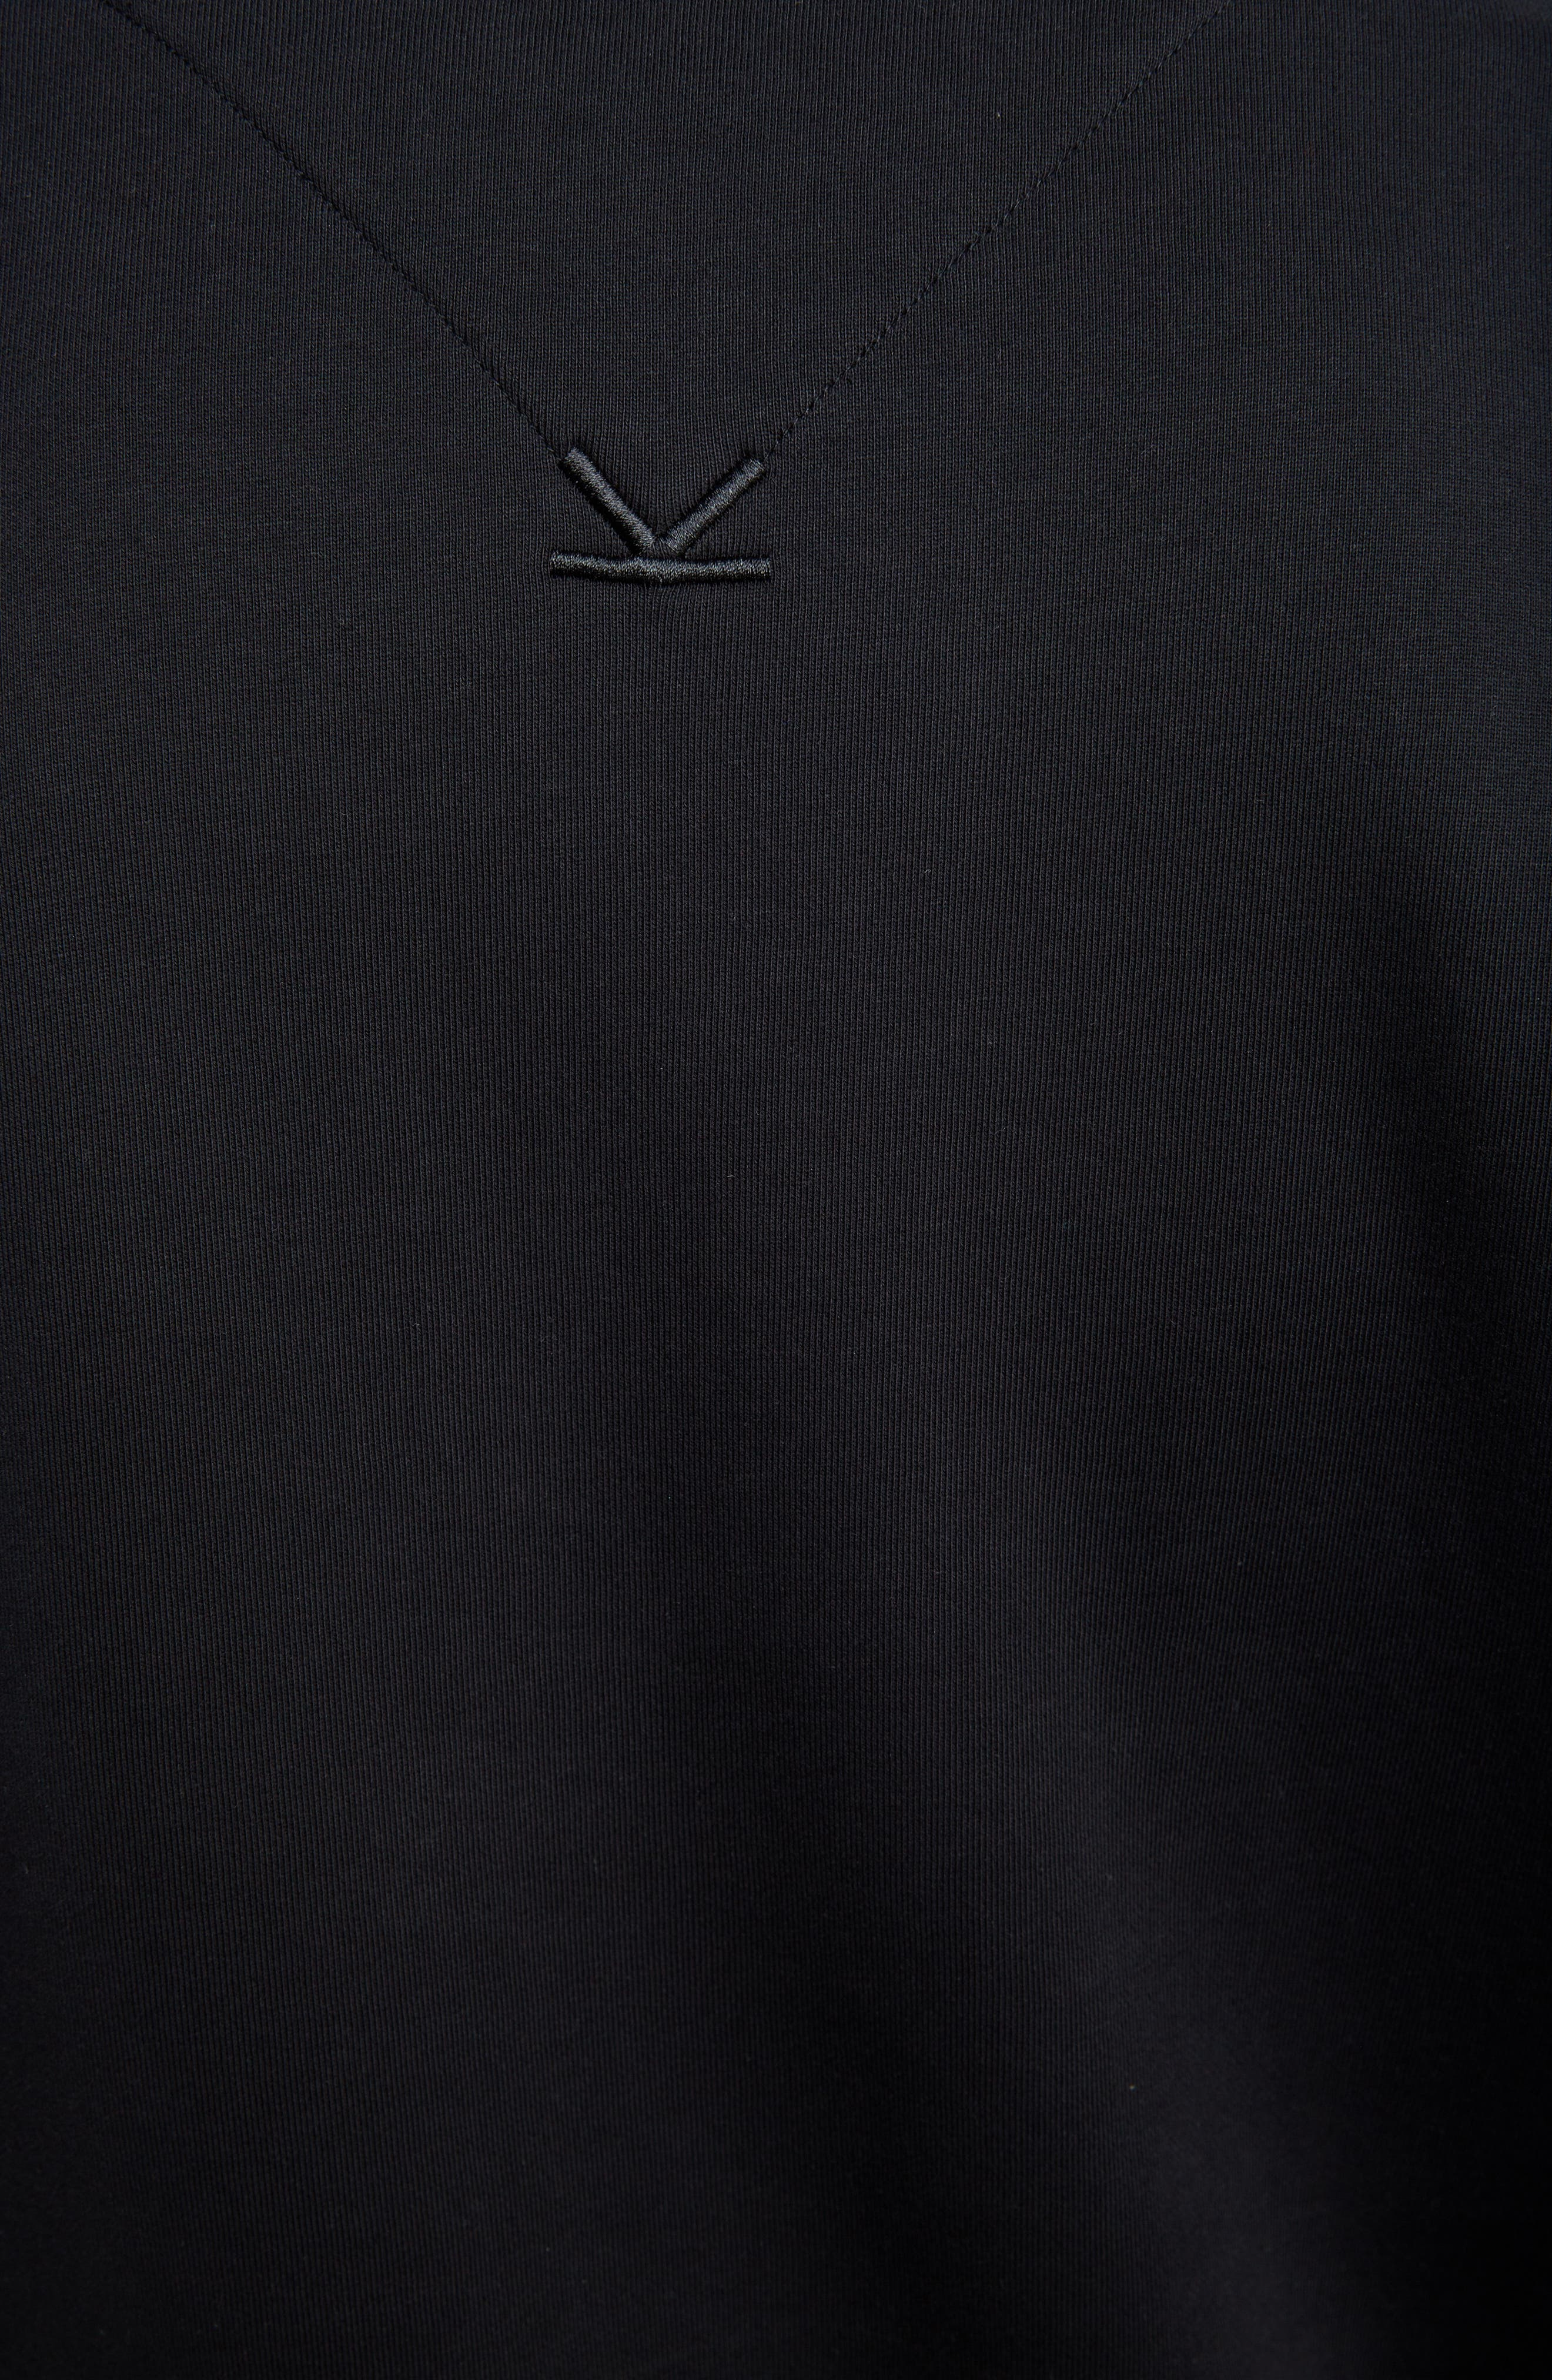 KENZO, Oversize Colorblock Sweatshirt, Alternate thumbnail 5, color, DOVE GREY